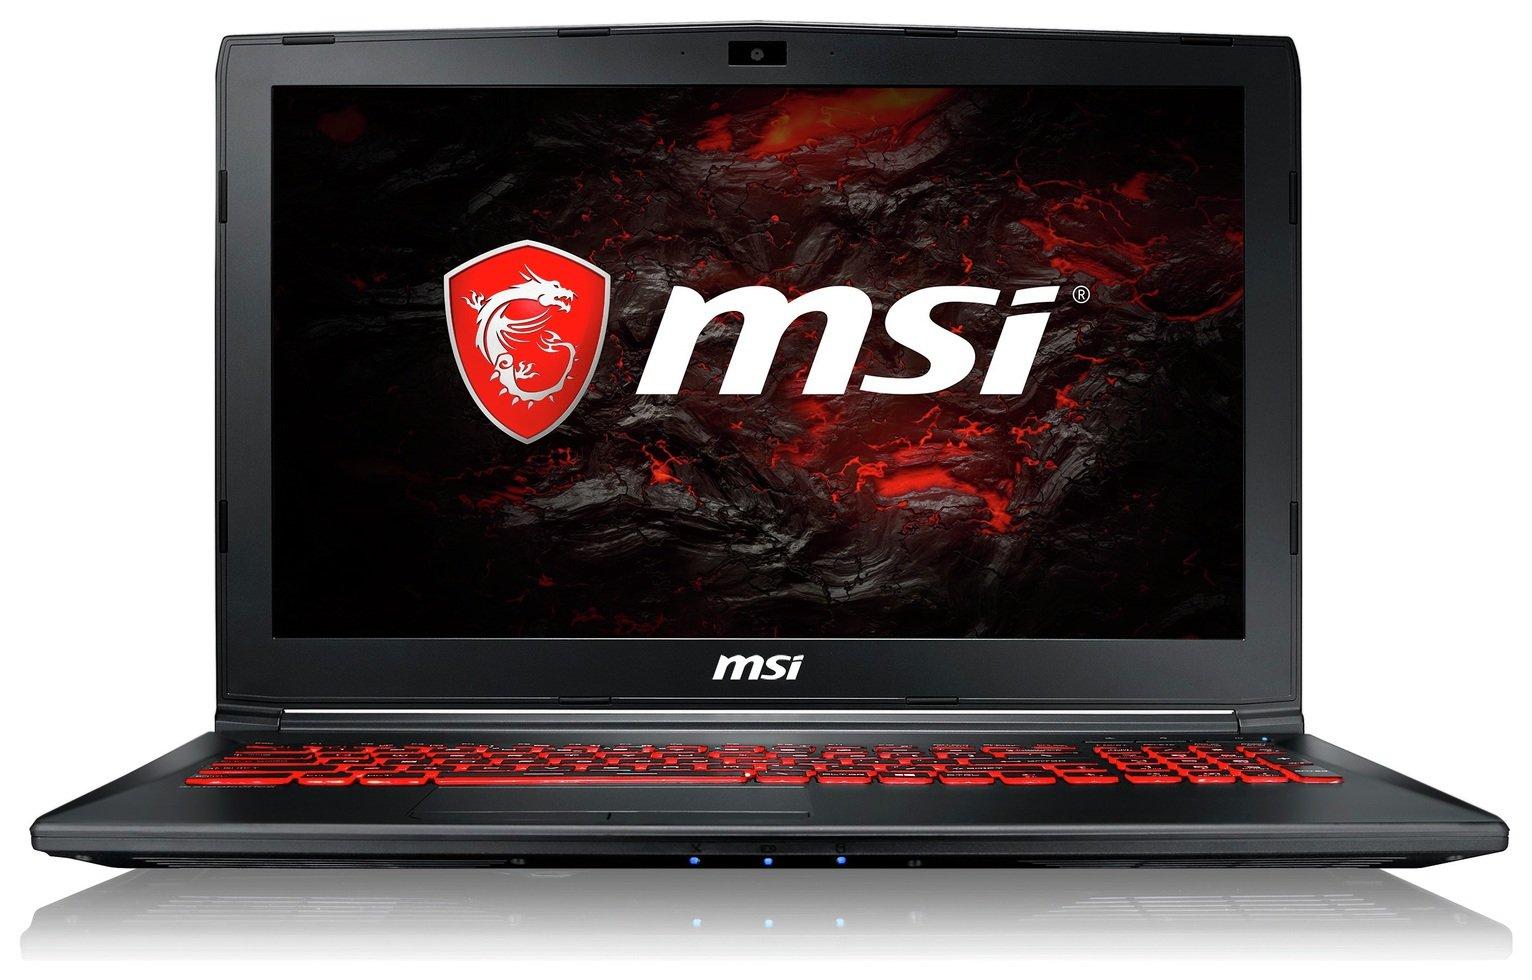 MSI MSI GL62M 15.6 Inch i7 16GB 1TB Gaming Notebook